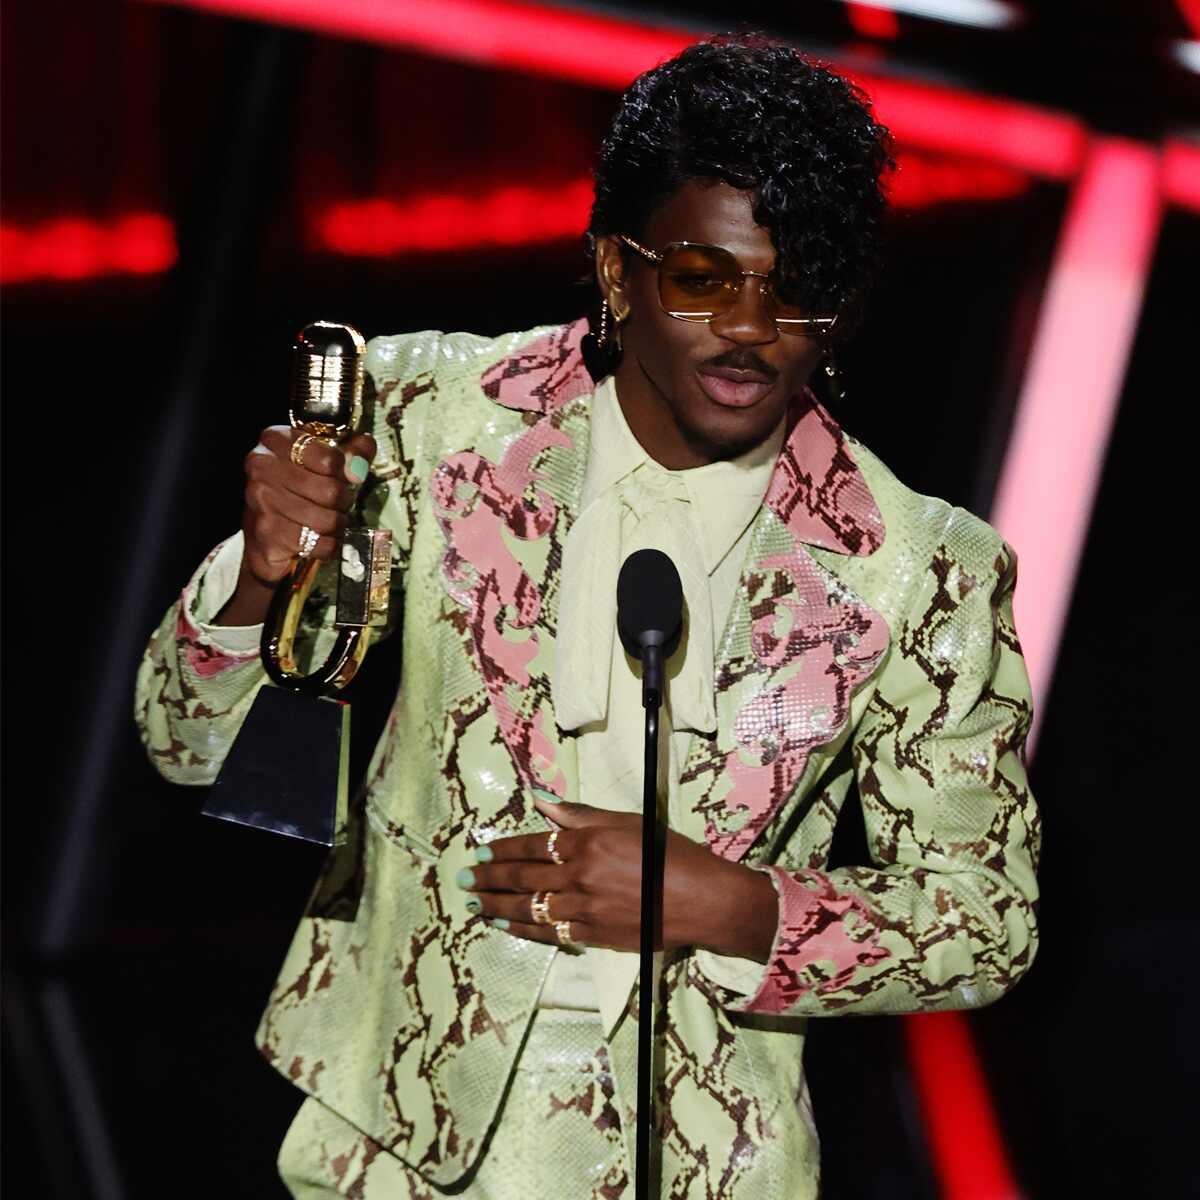 Billboard Music Awards, Lil Nas X